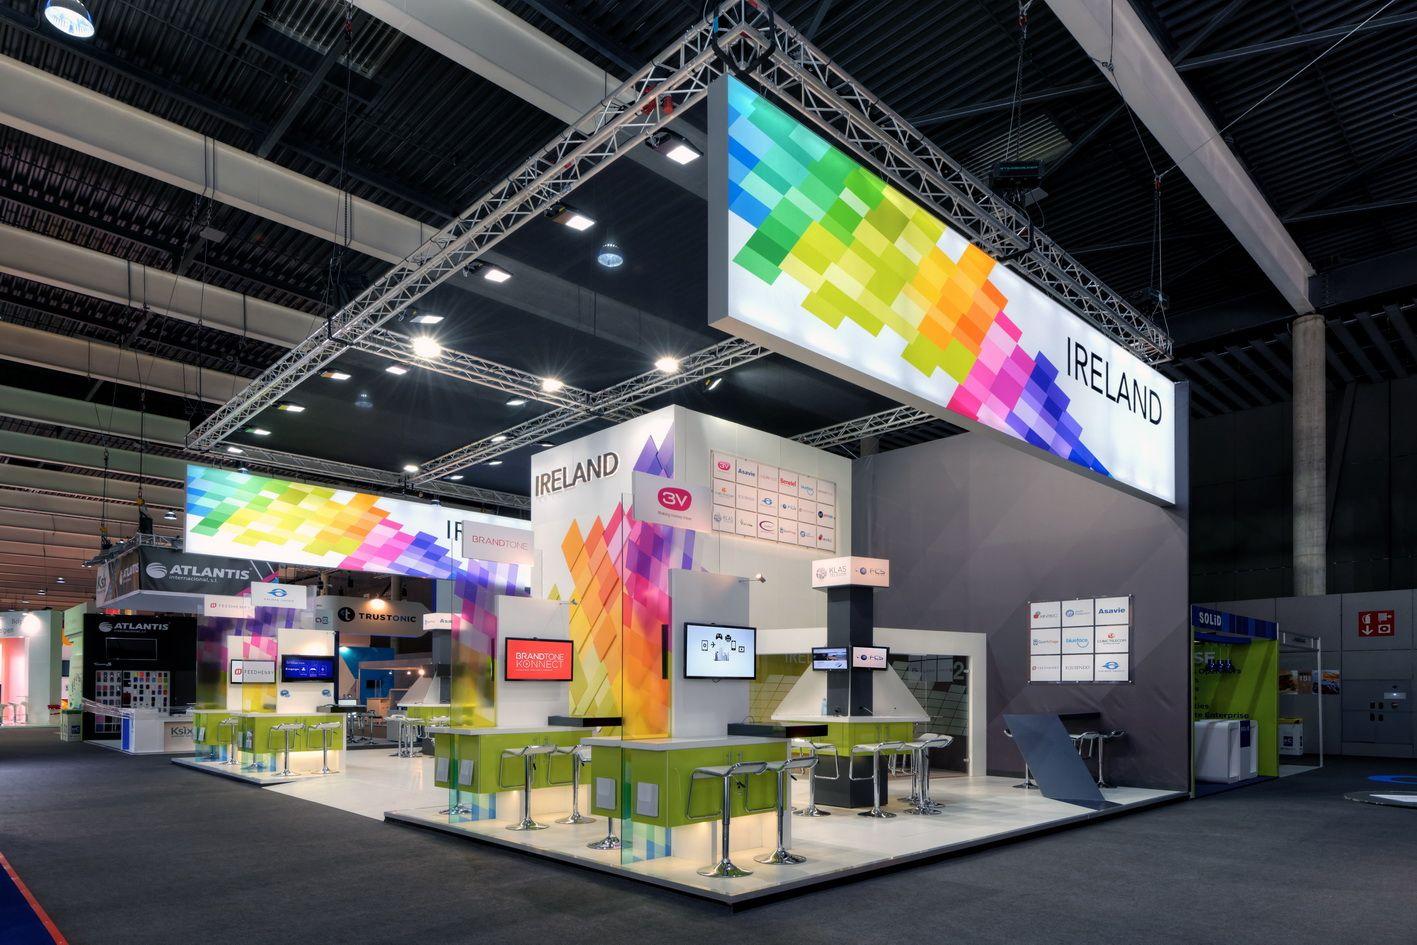 Exhibition Stand Design Barcelona : Enterprise ireland stand gsma mobile world congress